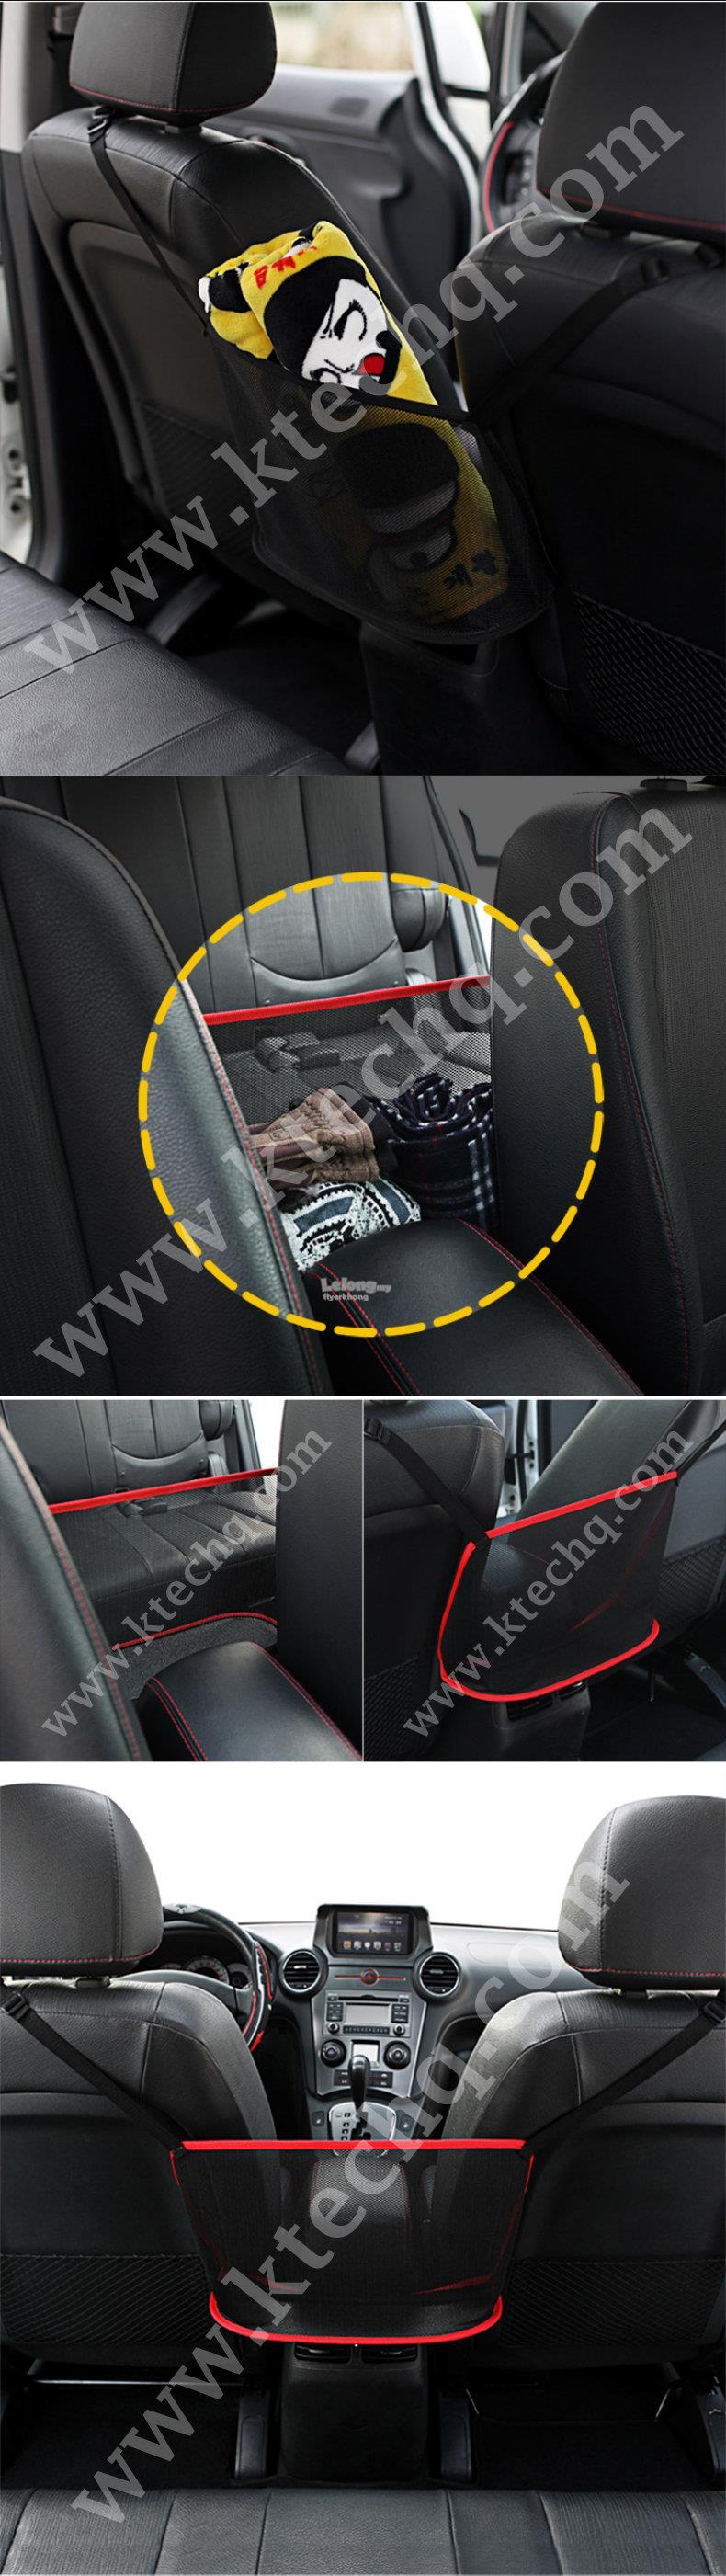 Korea Creative Car Seat Storage She (end 9/14/2018 10:15 AM)